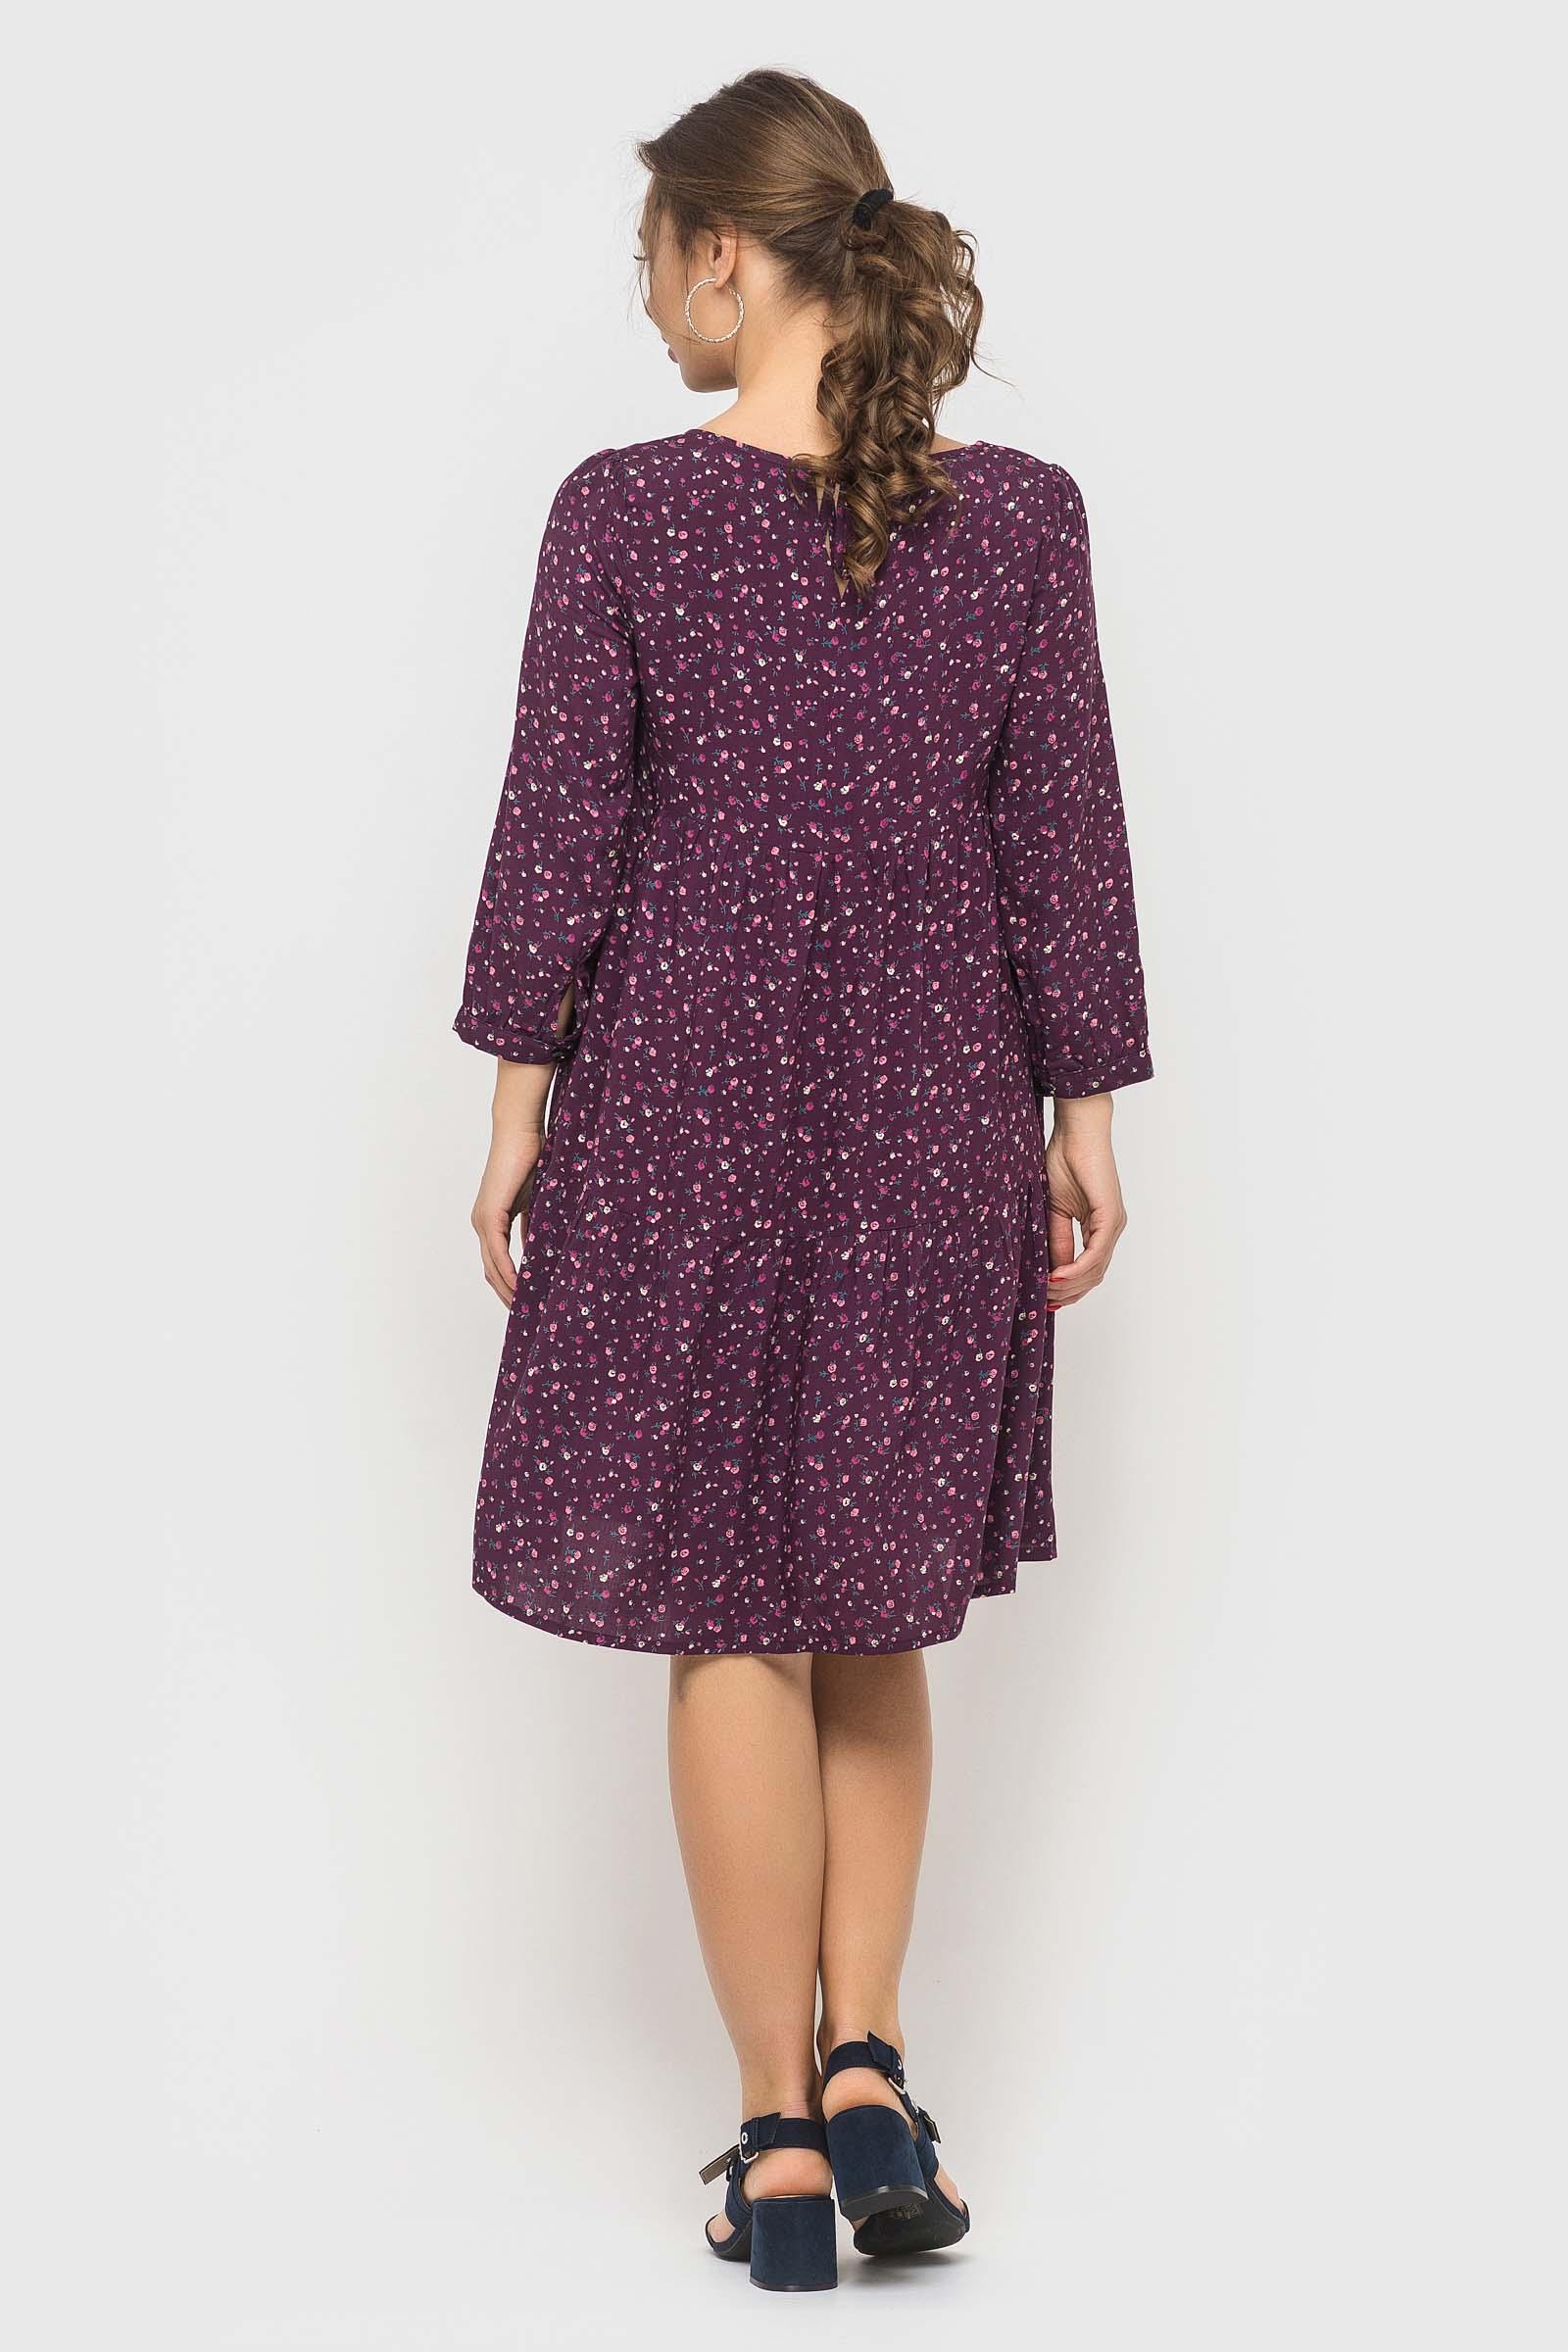 Платье цвета баклажан в стиле бохо